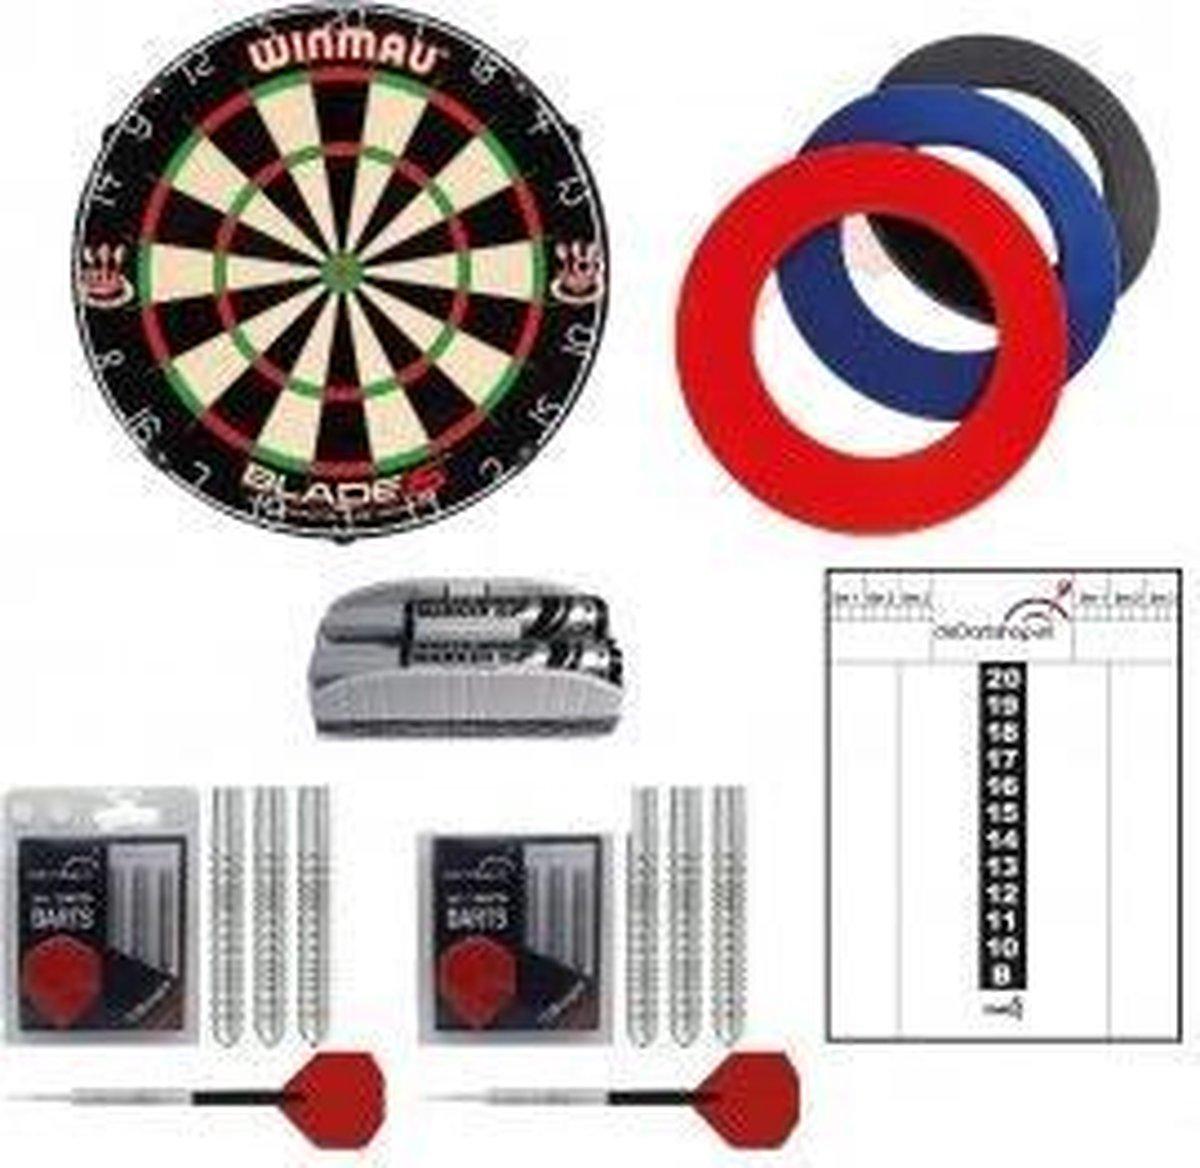 Winmau - Luxe complete dartset - dartbord - dartpijlen - surround ring - whitboard